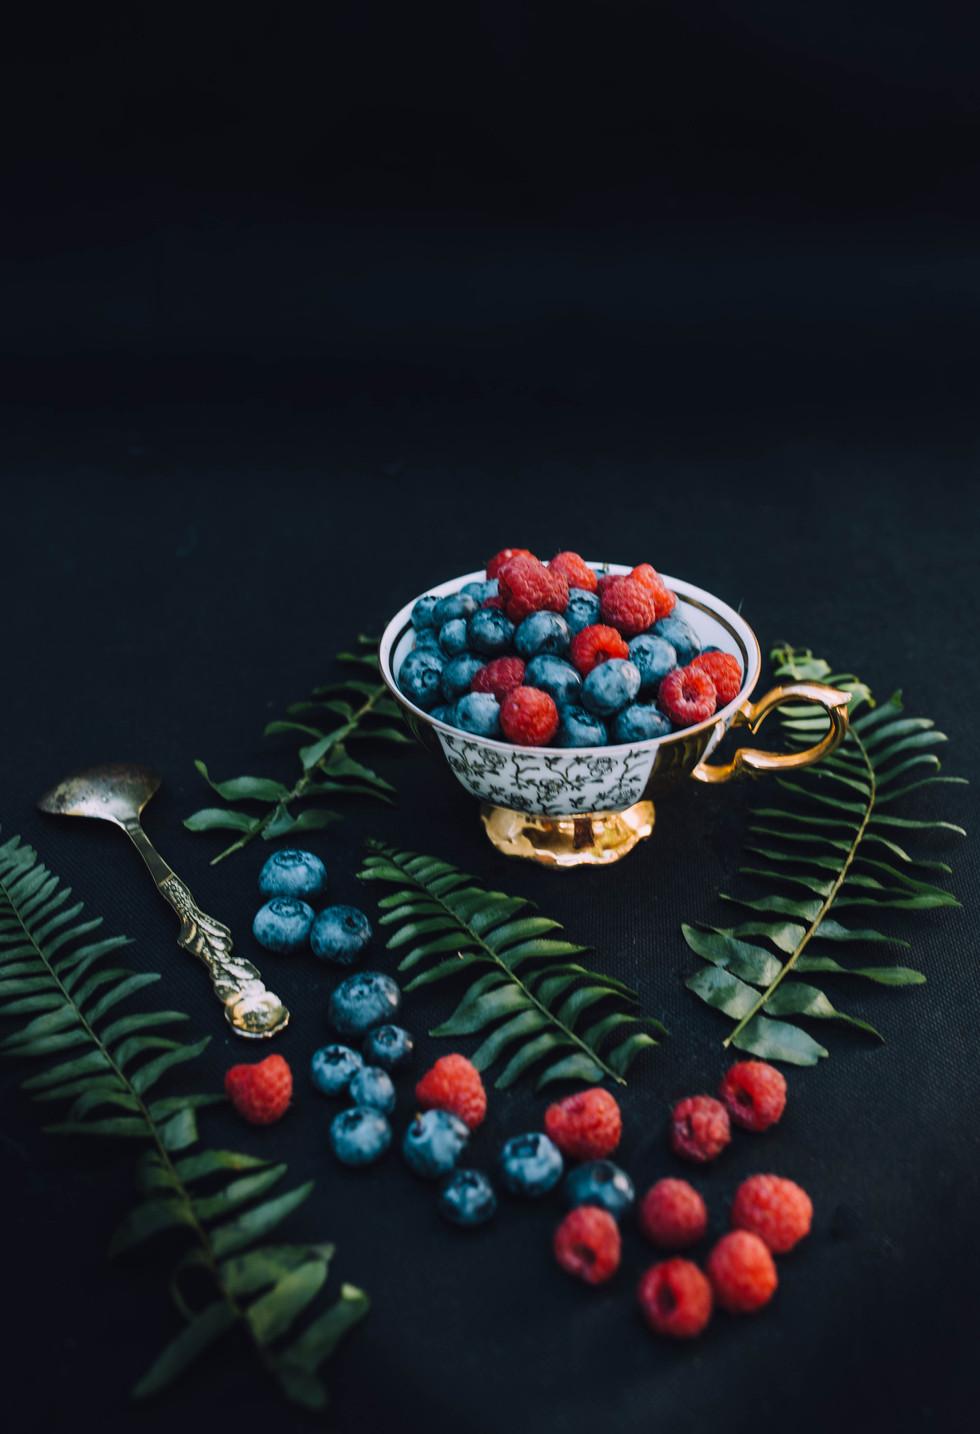 Still life photo of berries